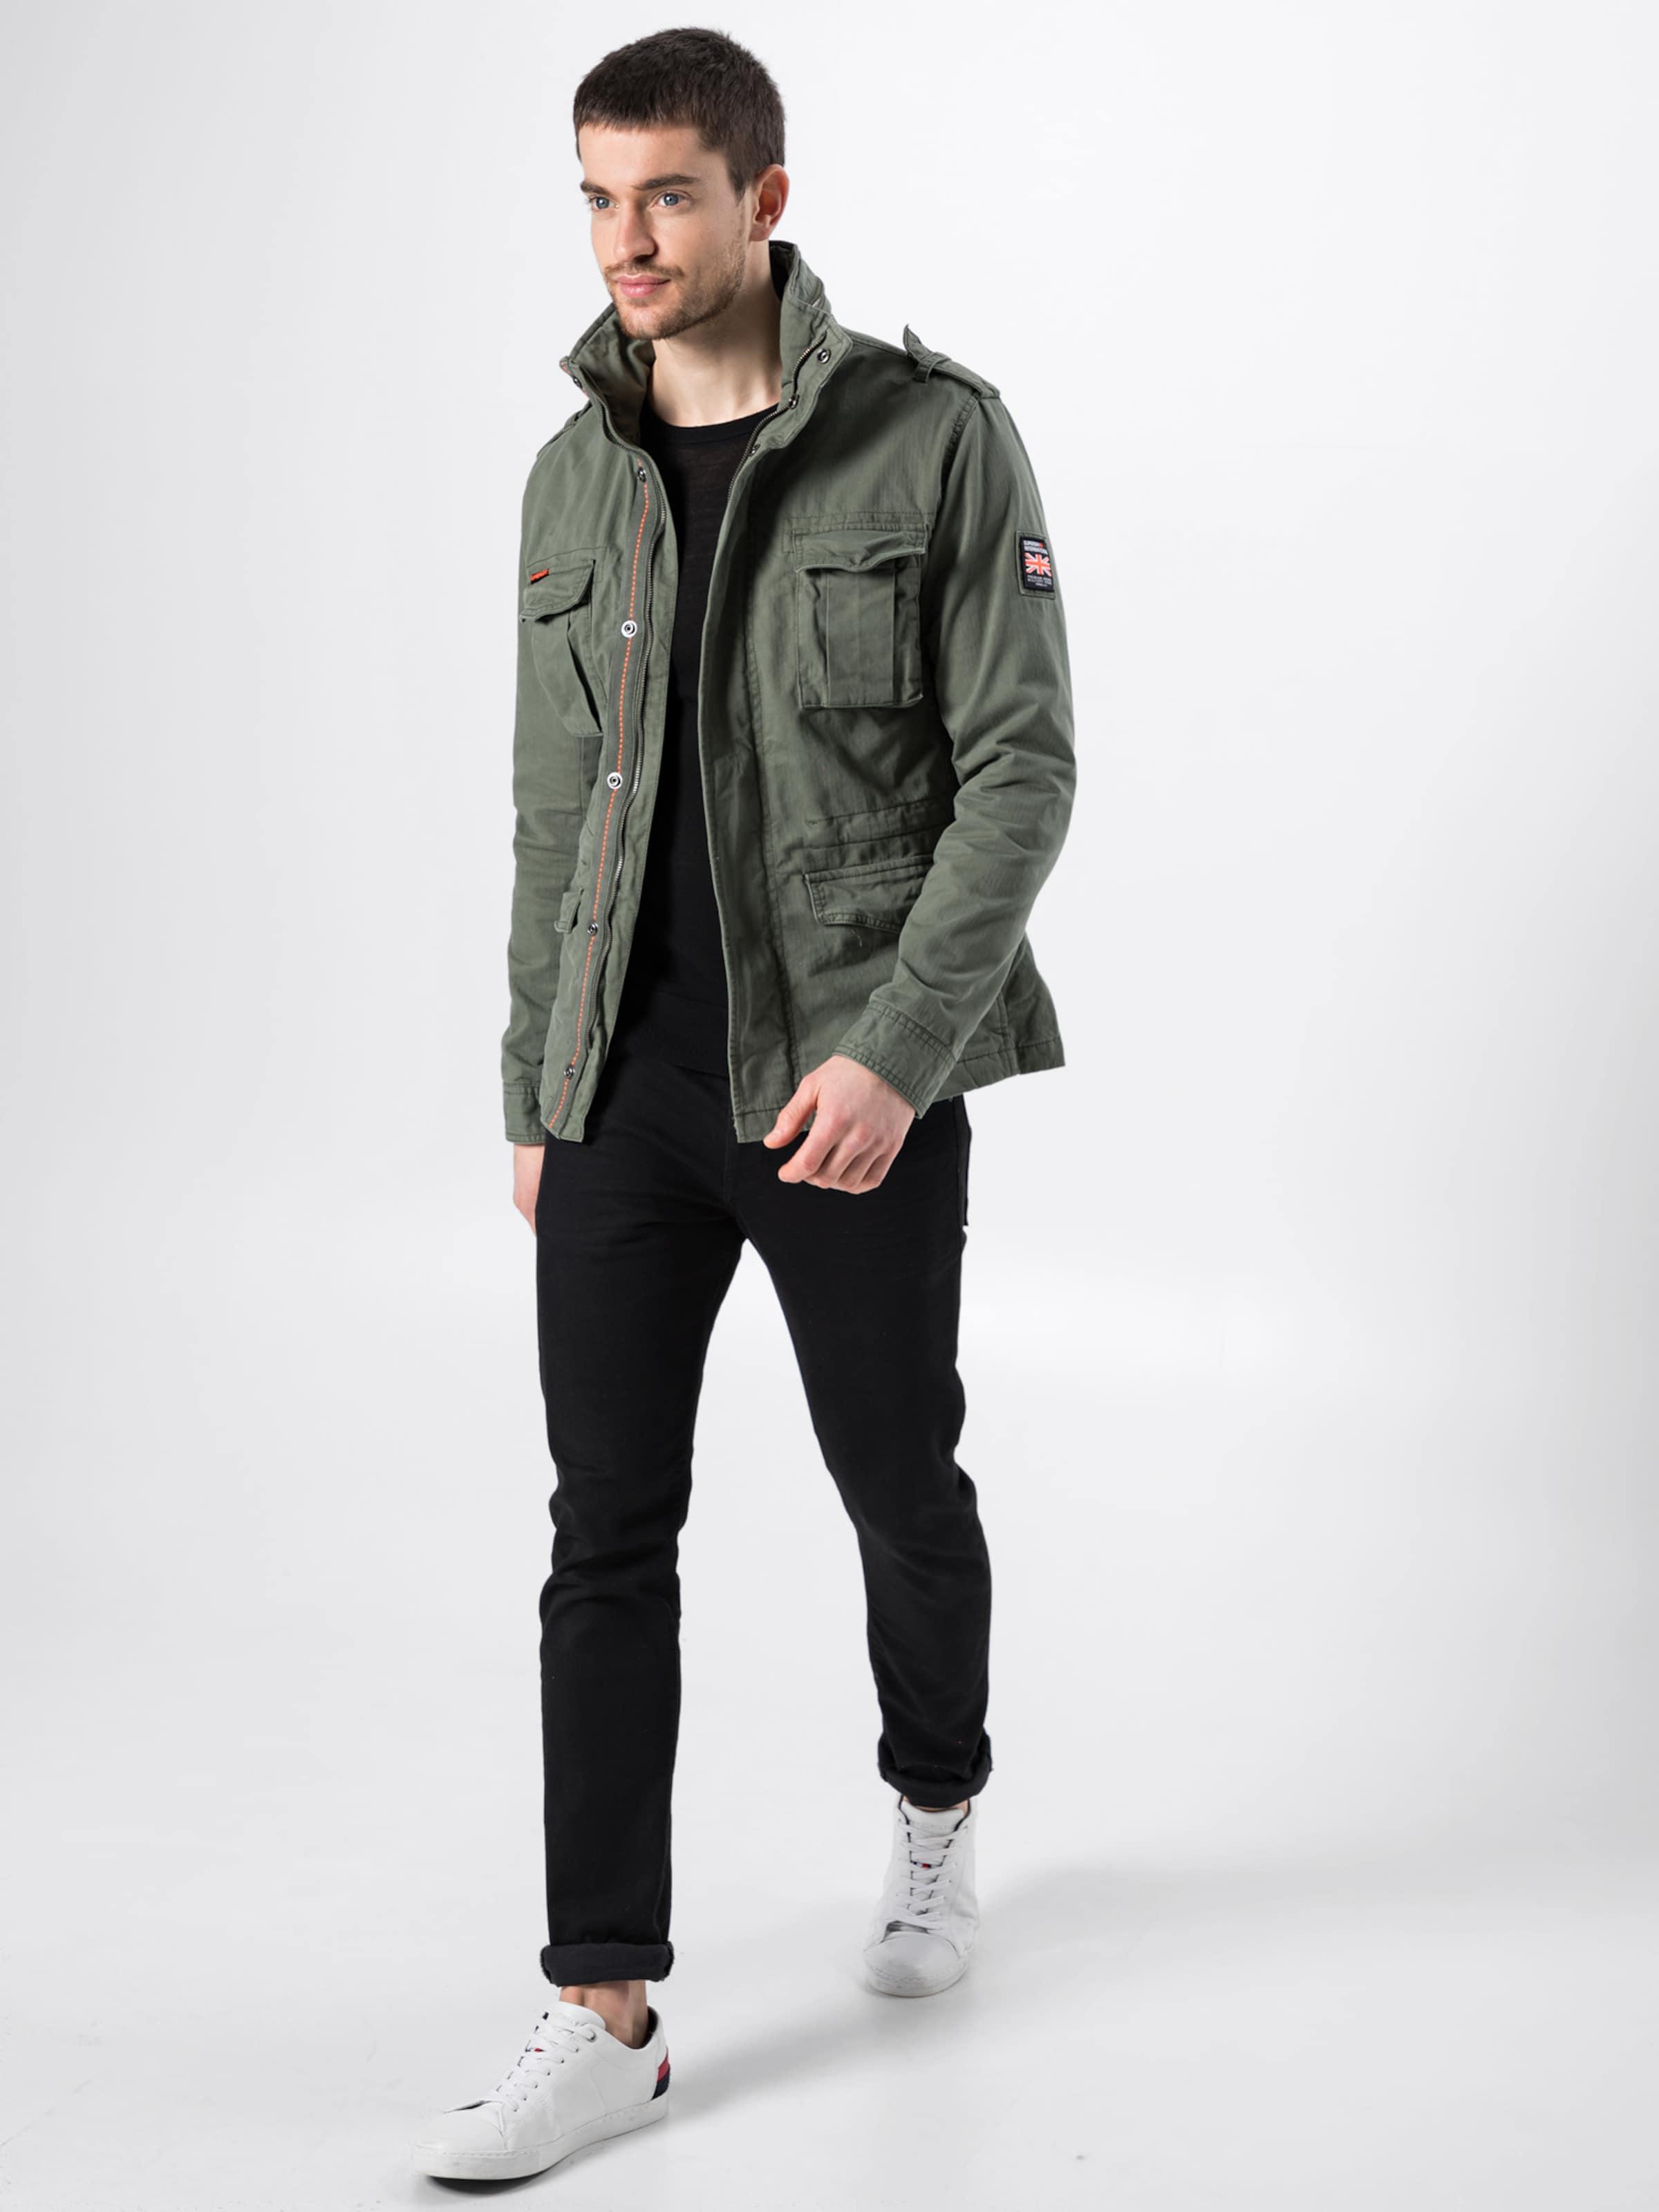 Kaki Pkt 'classic 4 Rookie En Superdry Veste saison Mi Jkt' pSUMzV